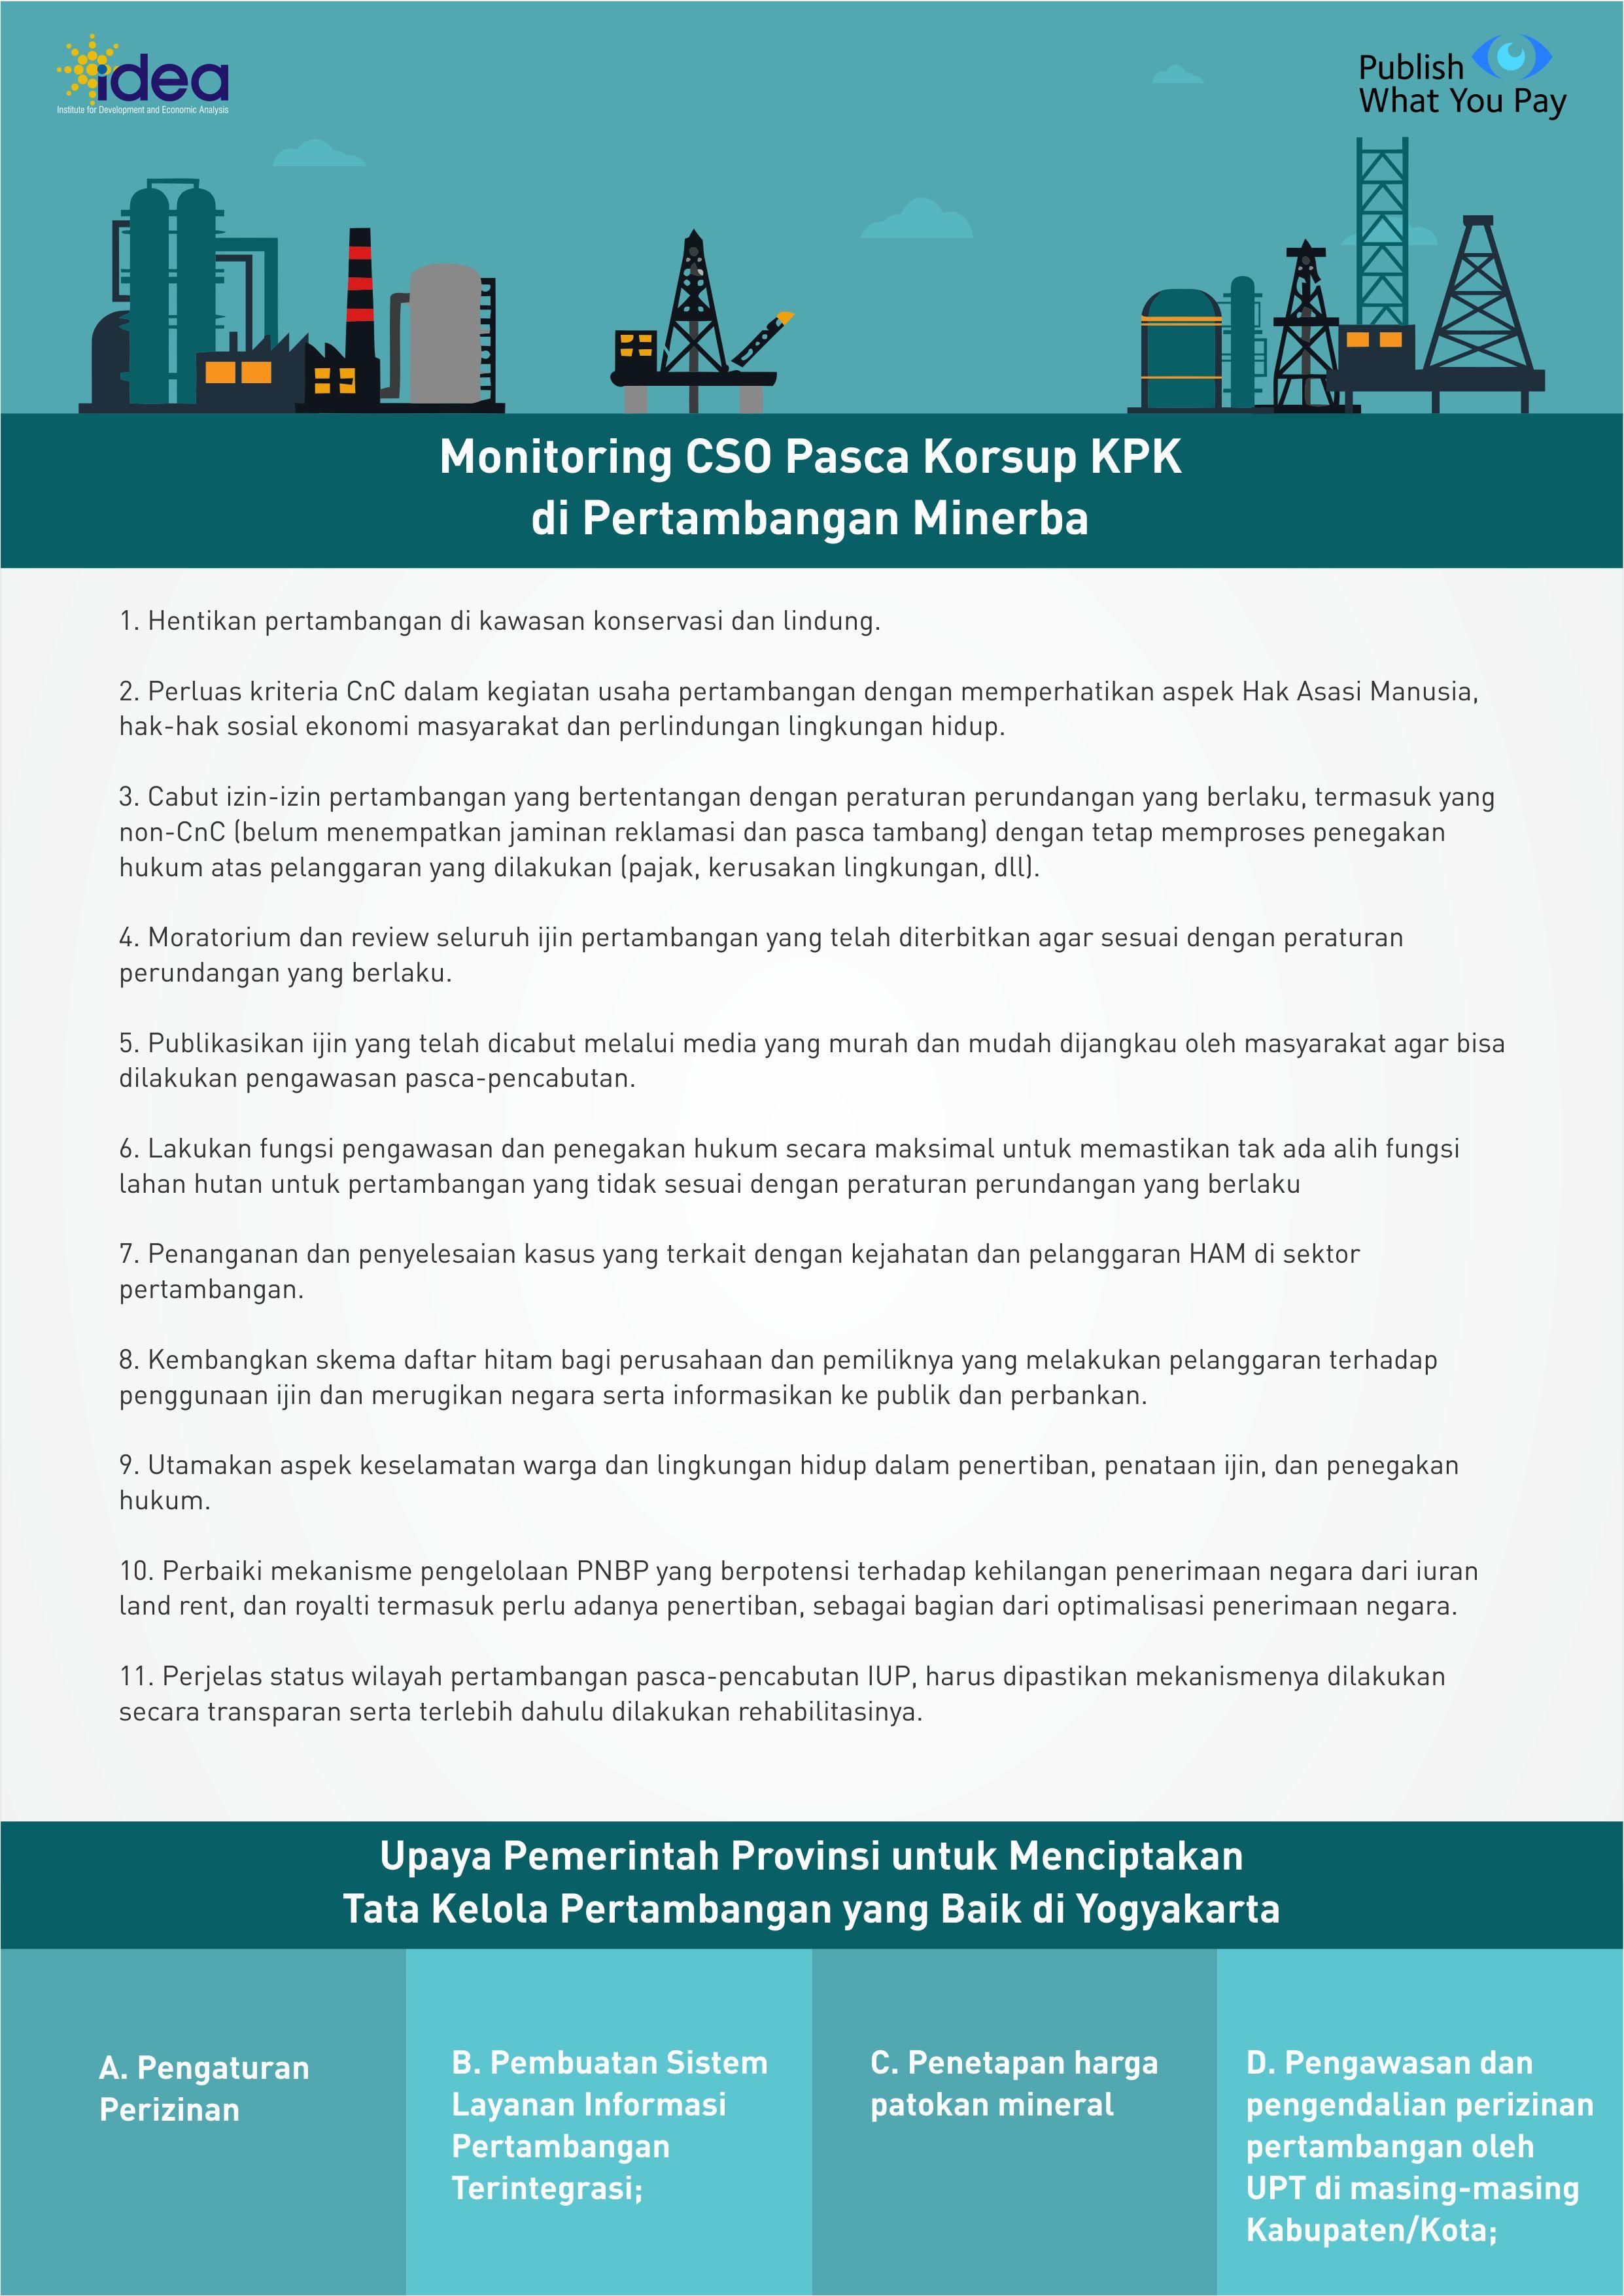 Infografis Monitoring Pasca Korsup KPK di Pertambangan Minerba